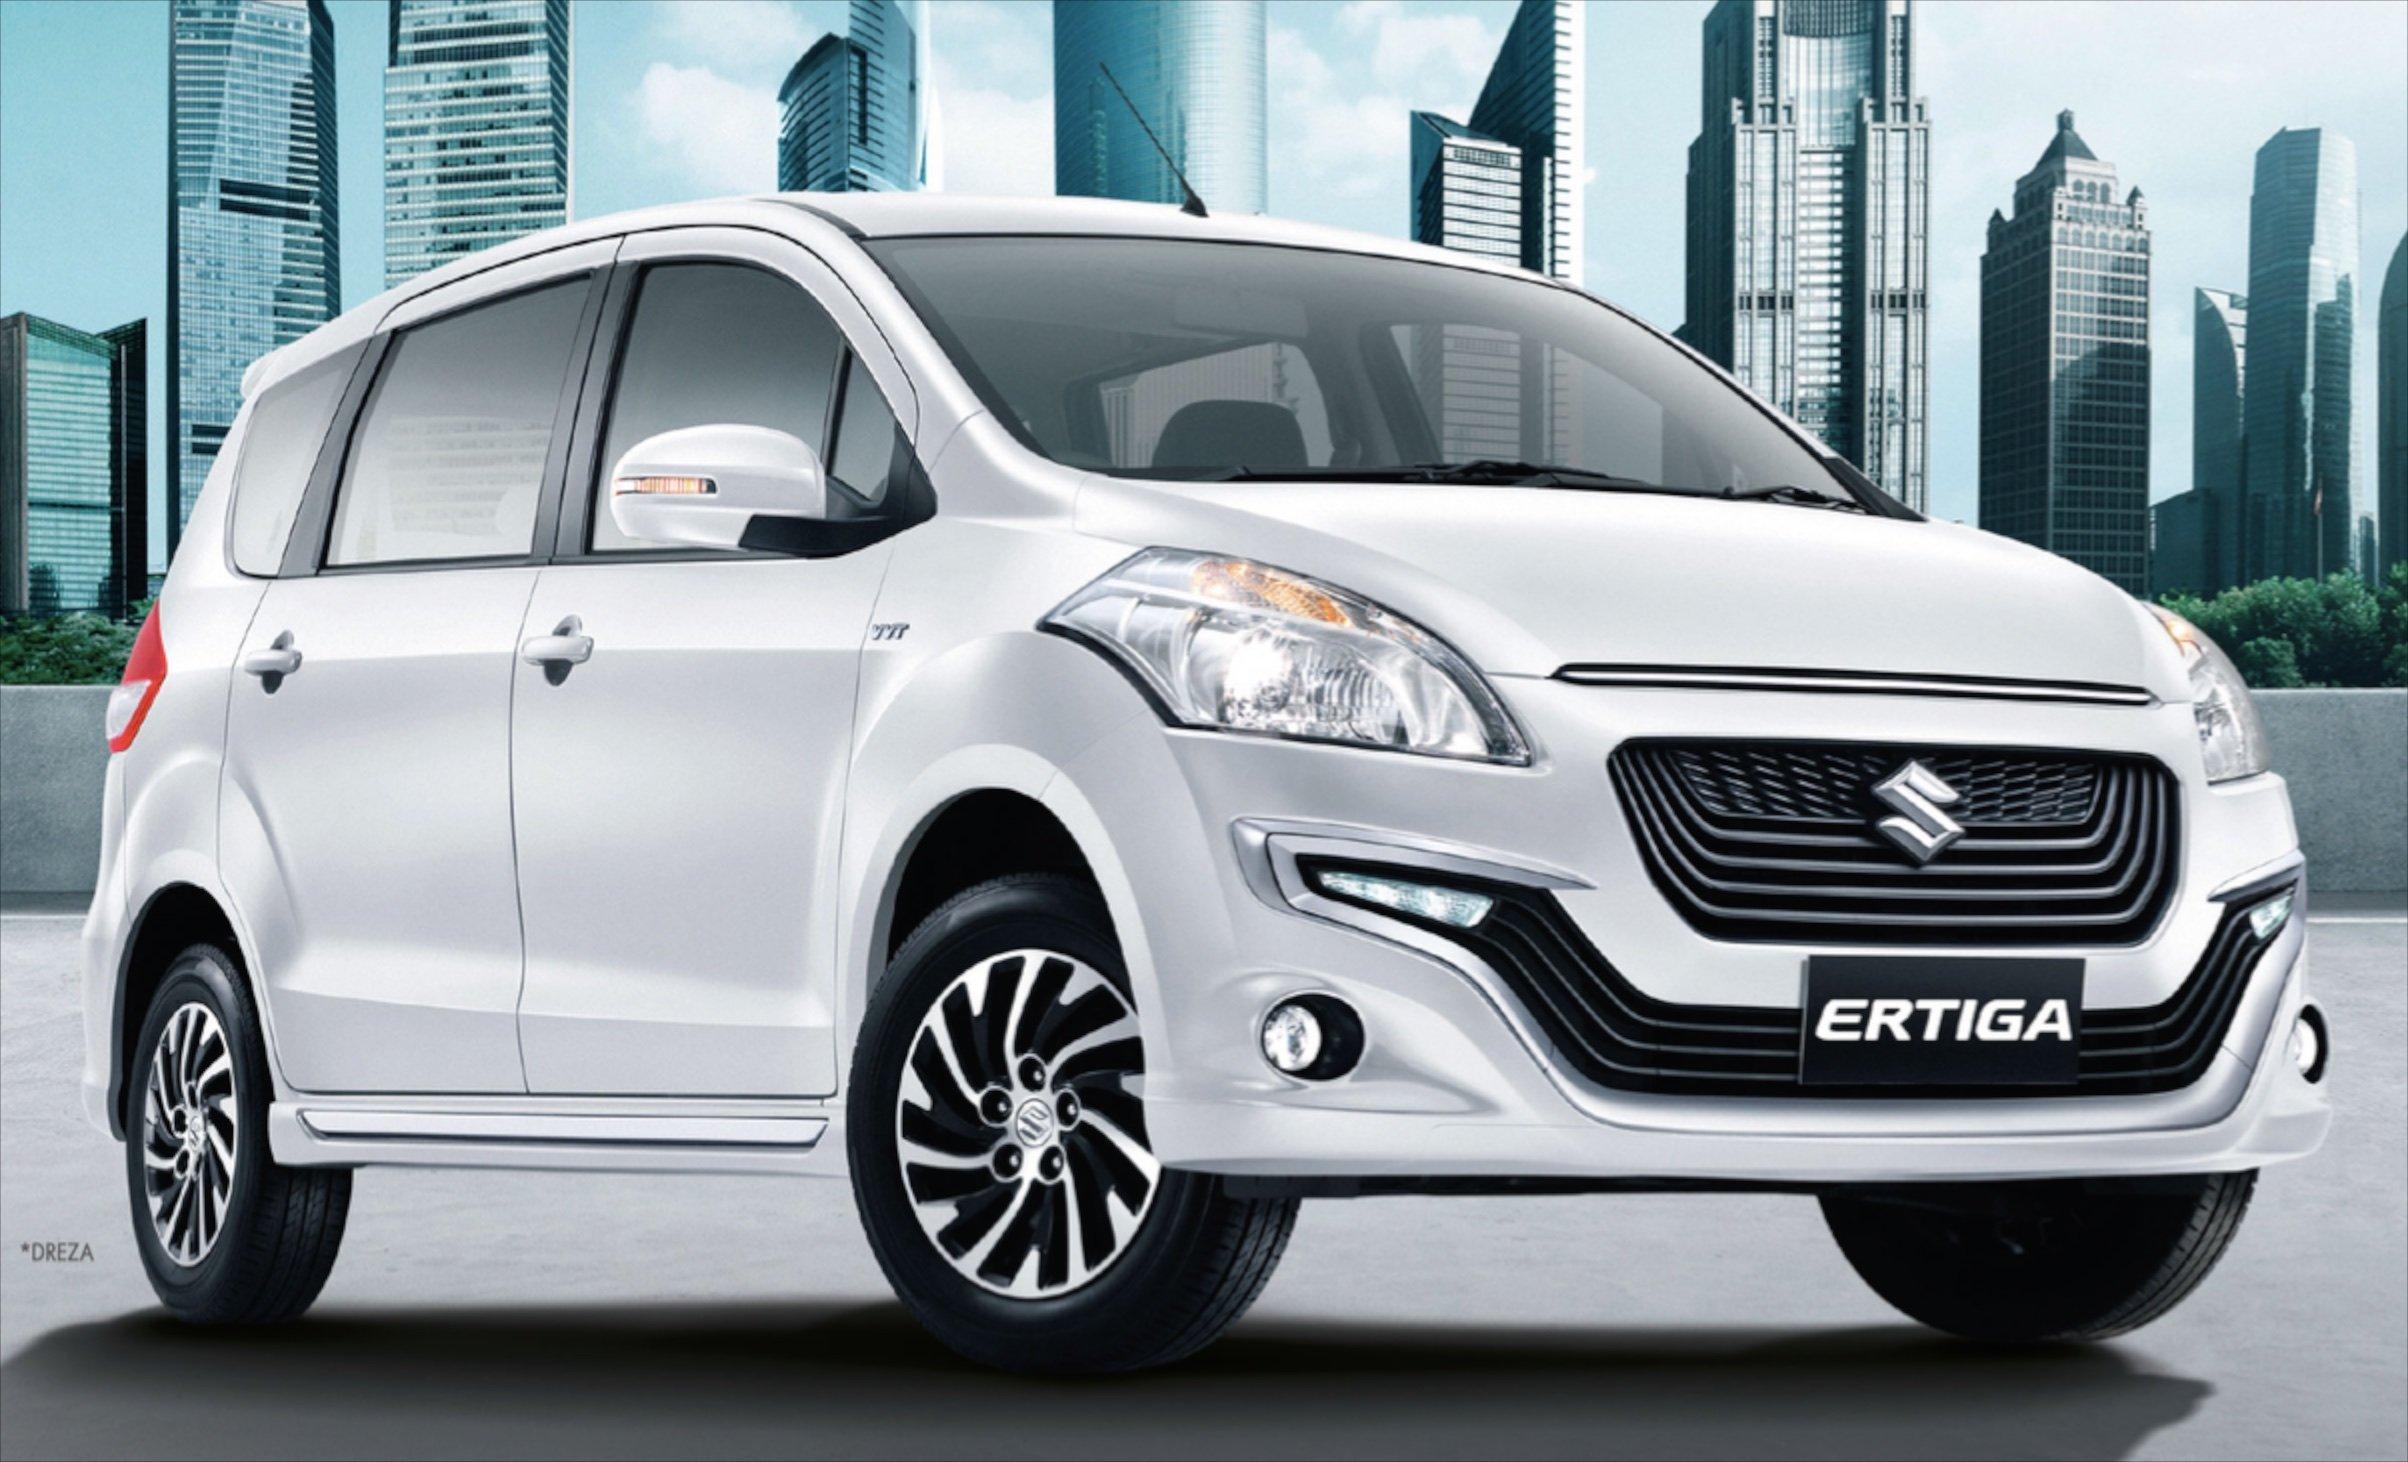 Suzuki Ertiga, Dreza launched in Thailand, from RM76k